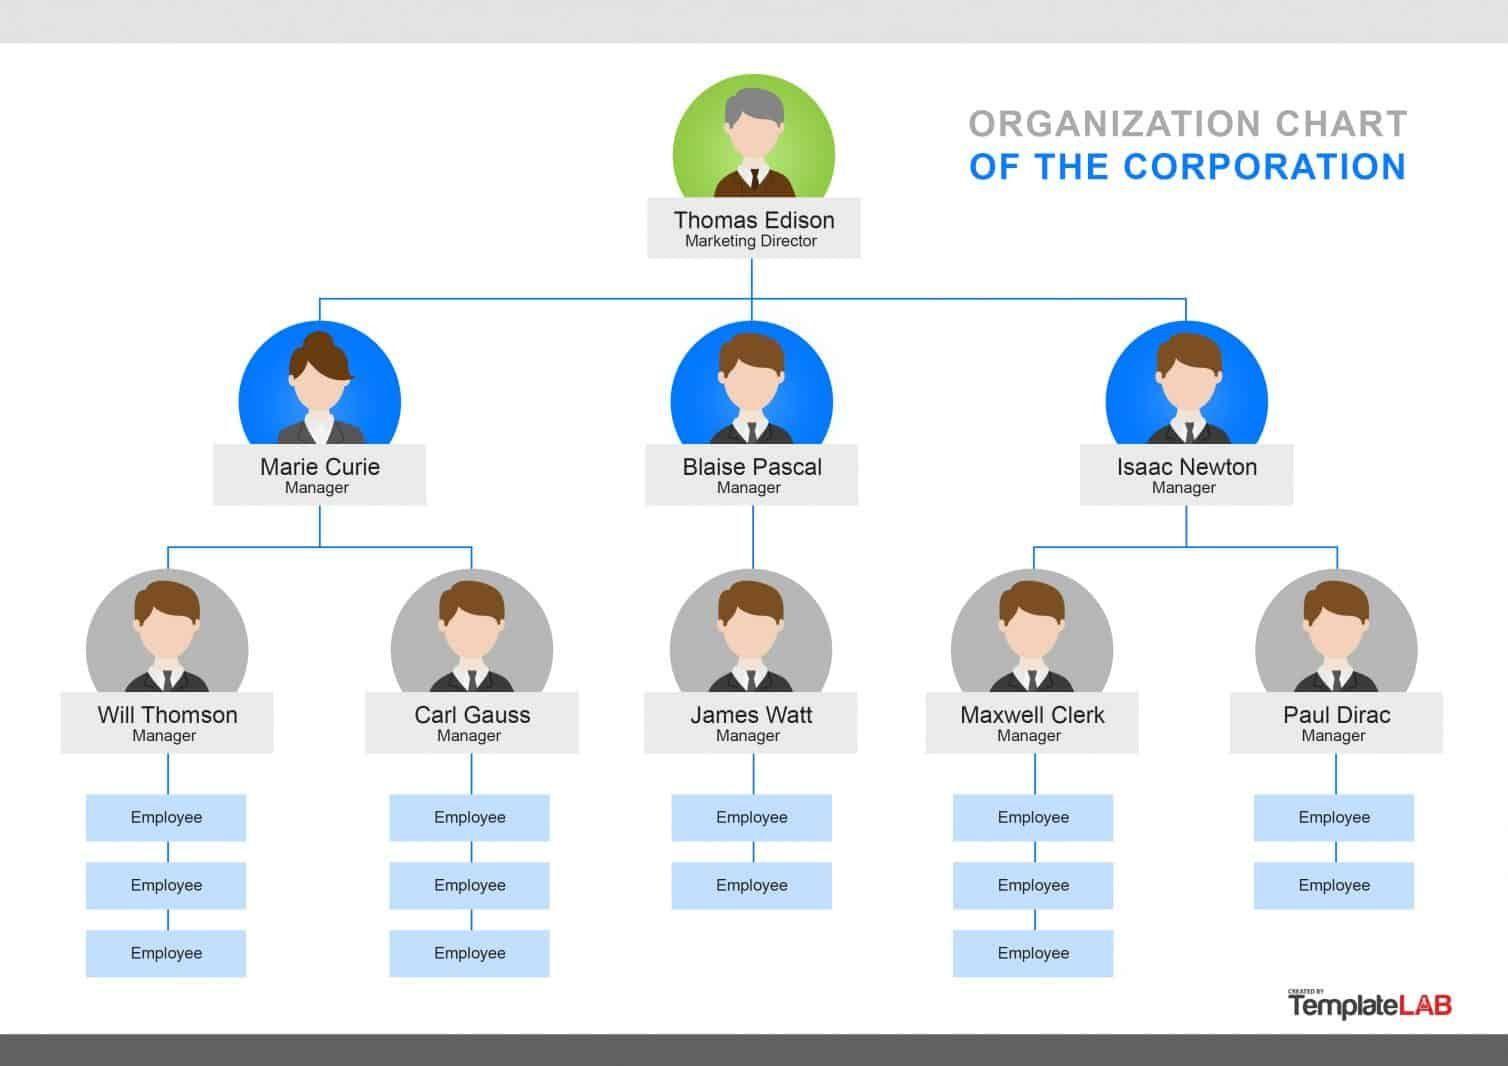 000 Frightening Organization Chart Template Excel 2010 Idea  Org OrganizationalFull